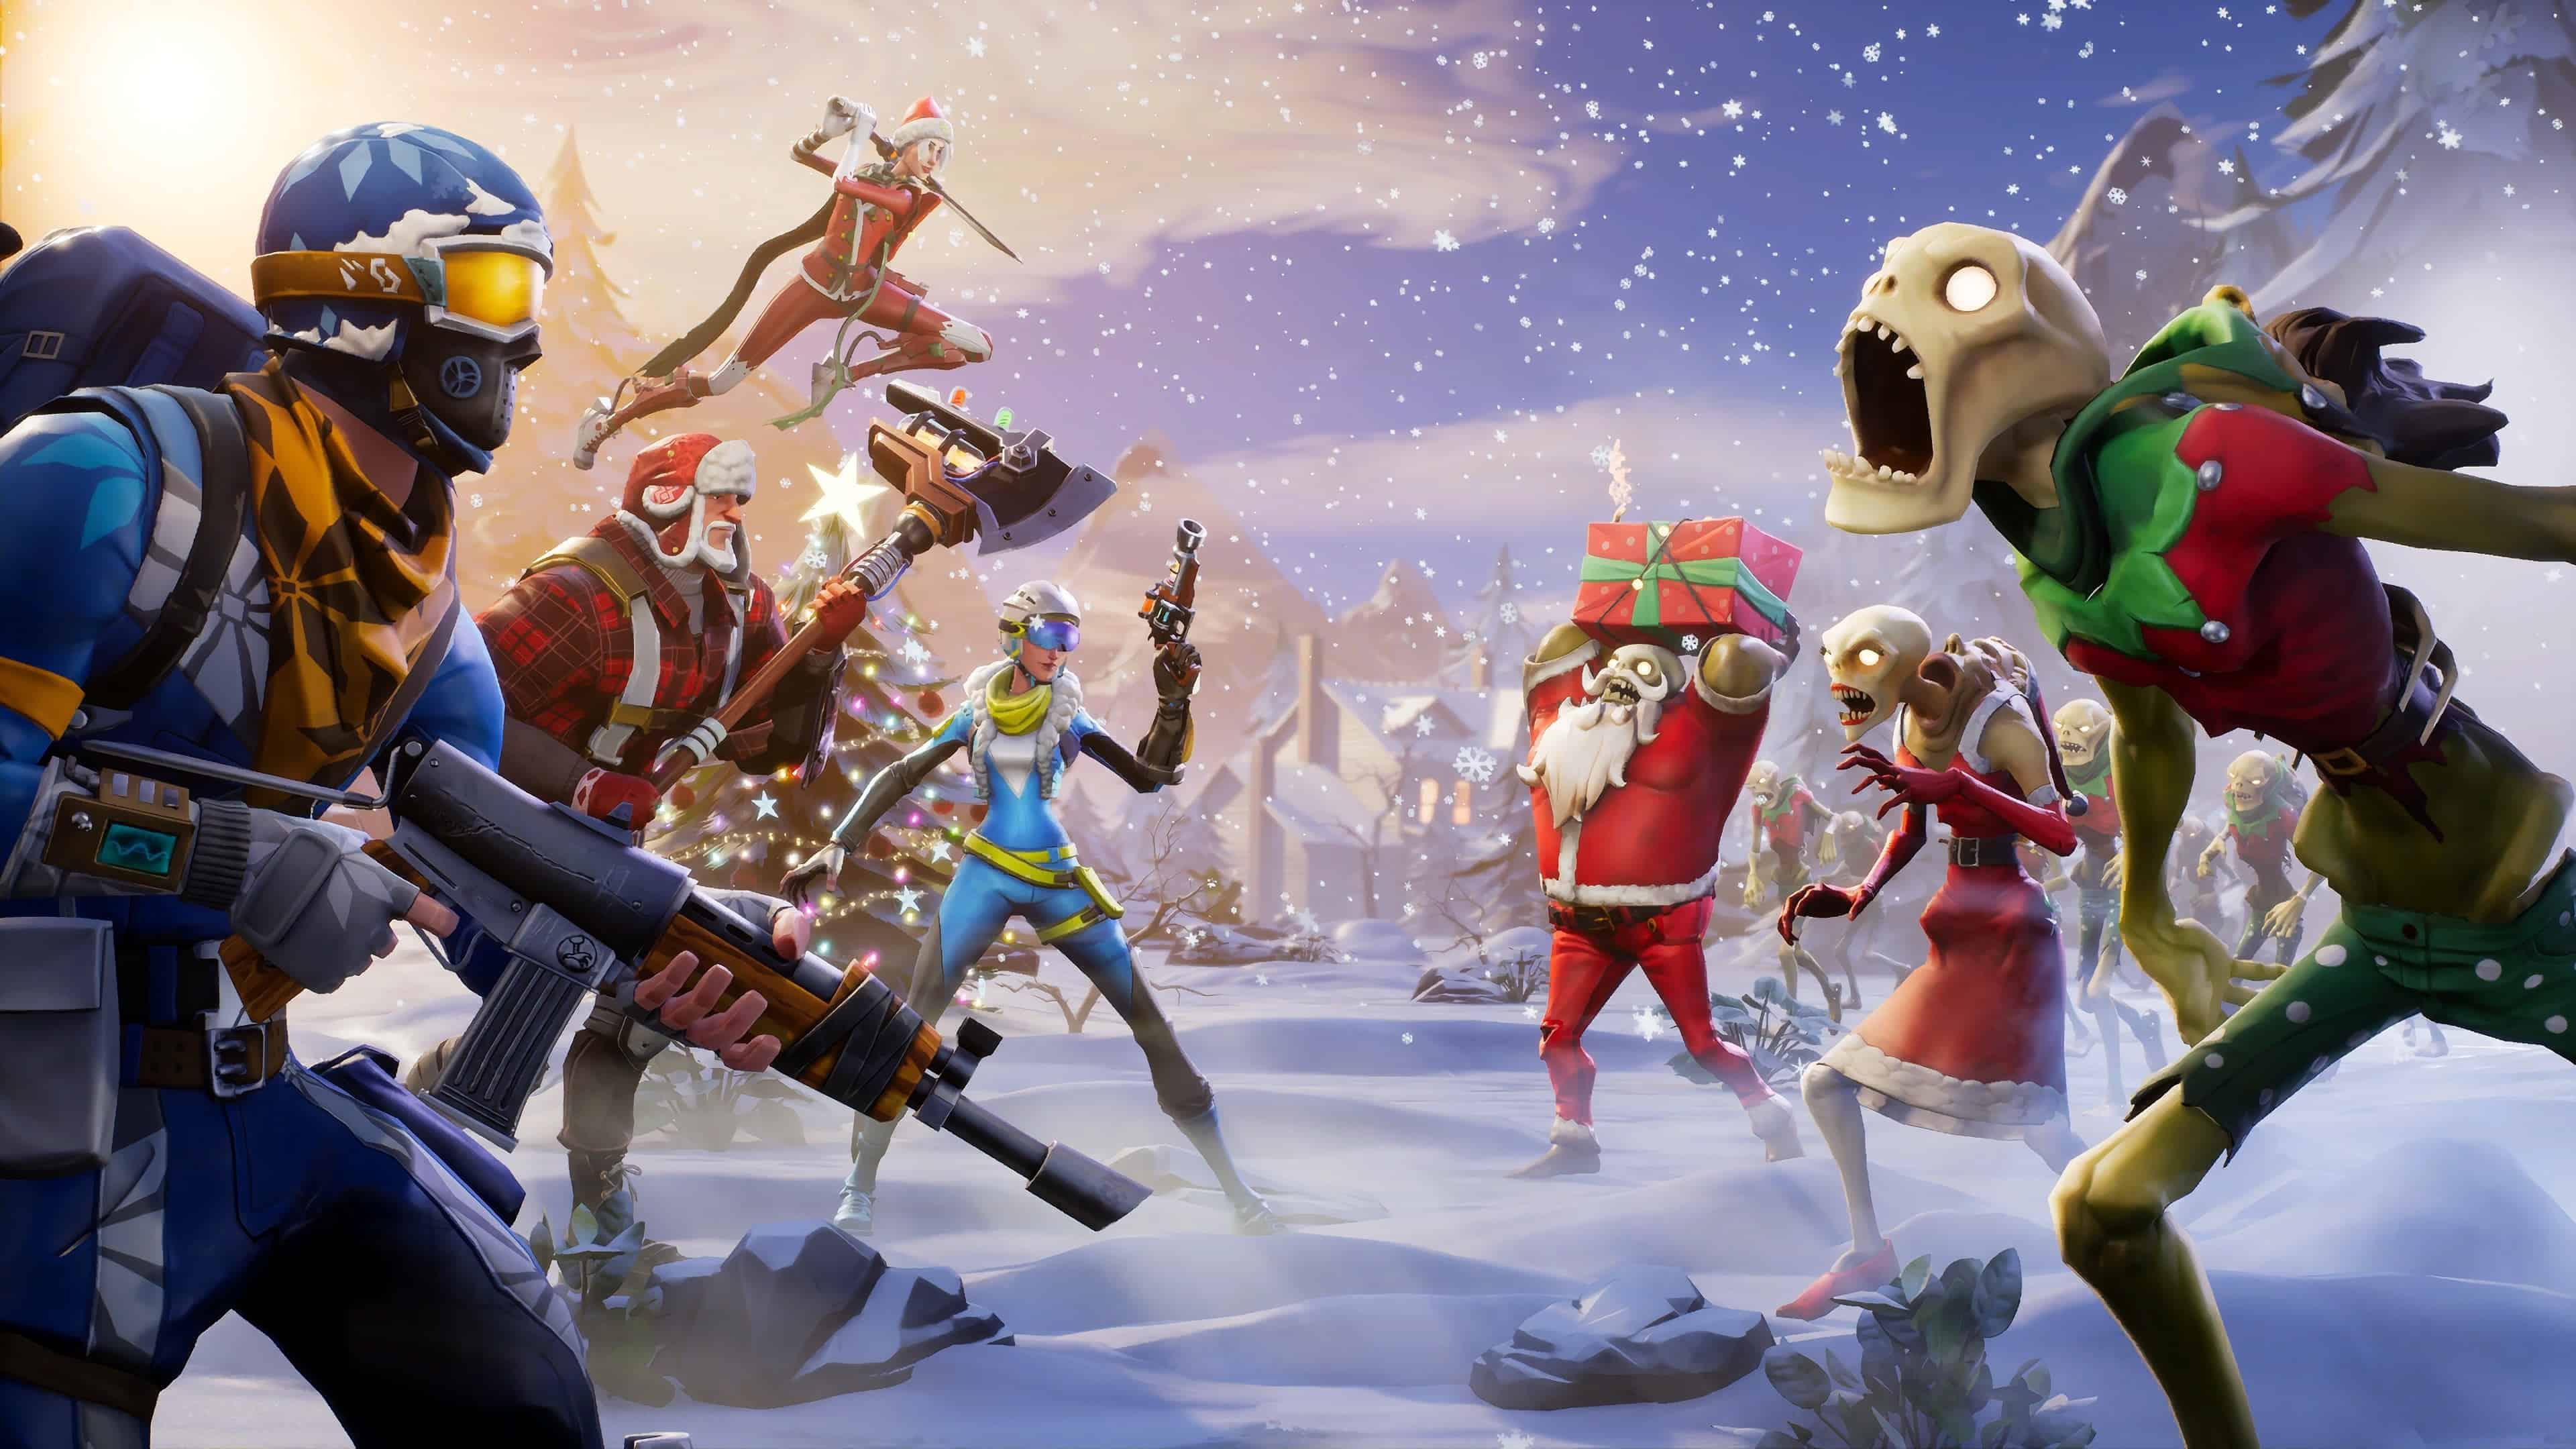 Fortnite Winter Season UHD 4K Wallpaper Pixelz 3840x2160